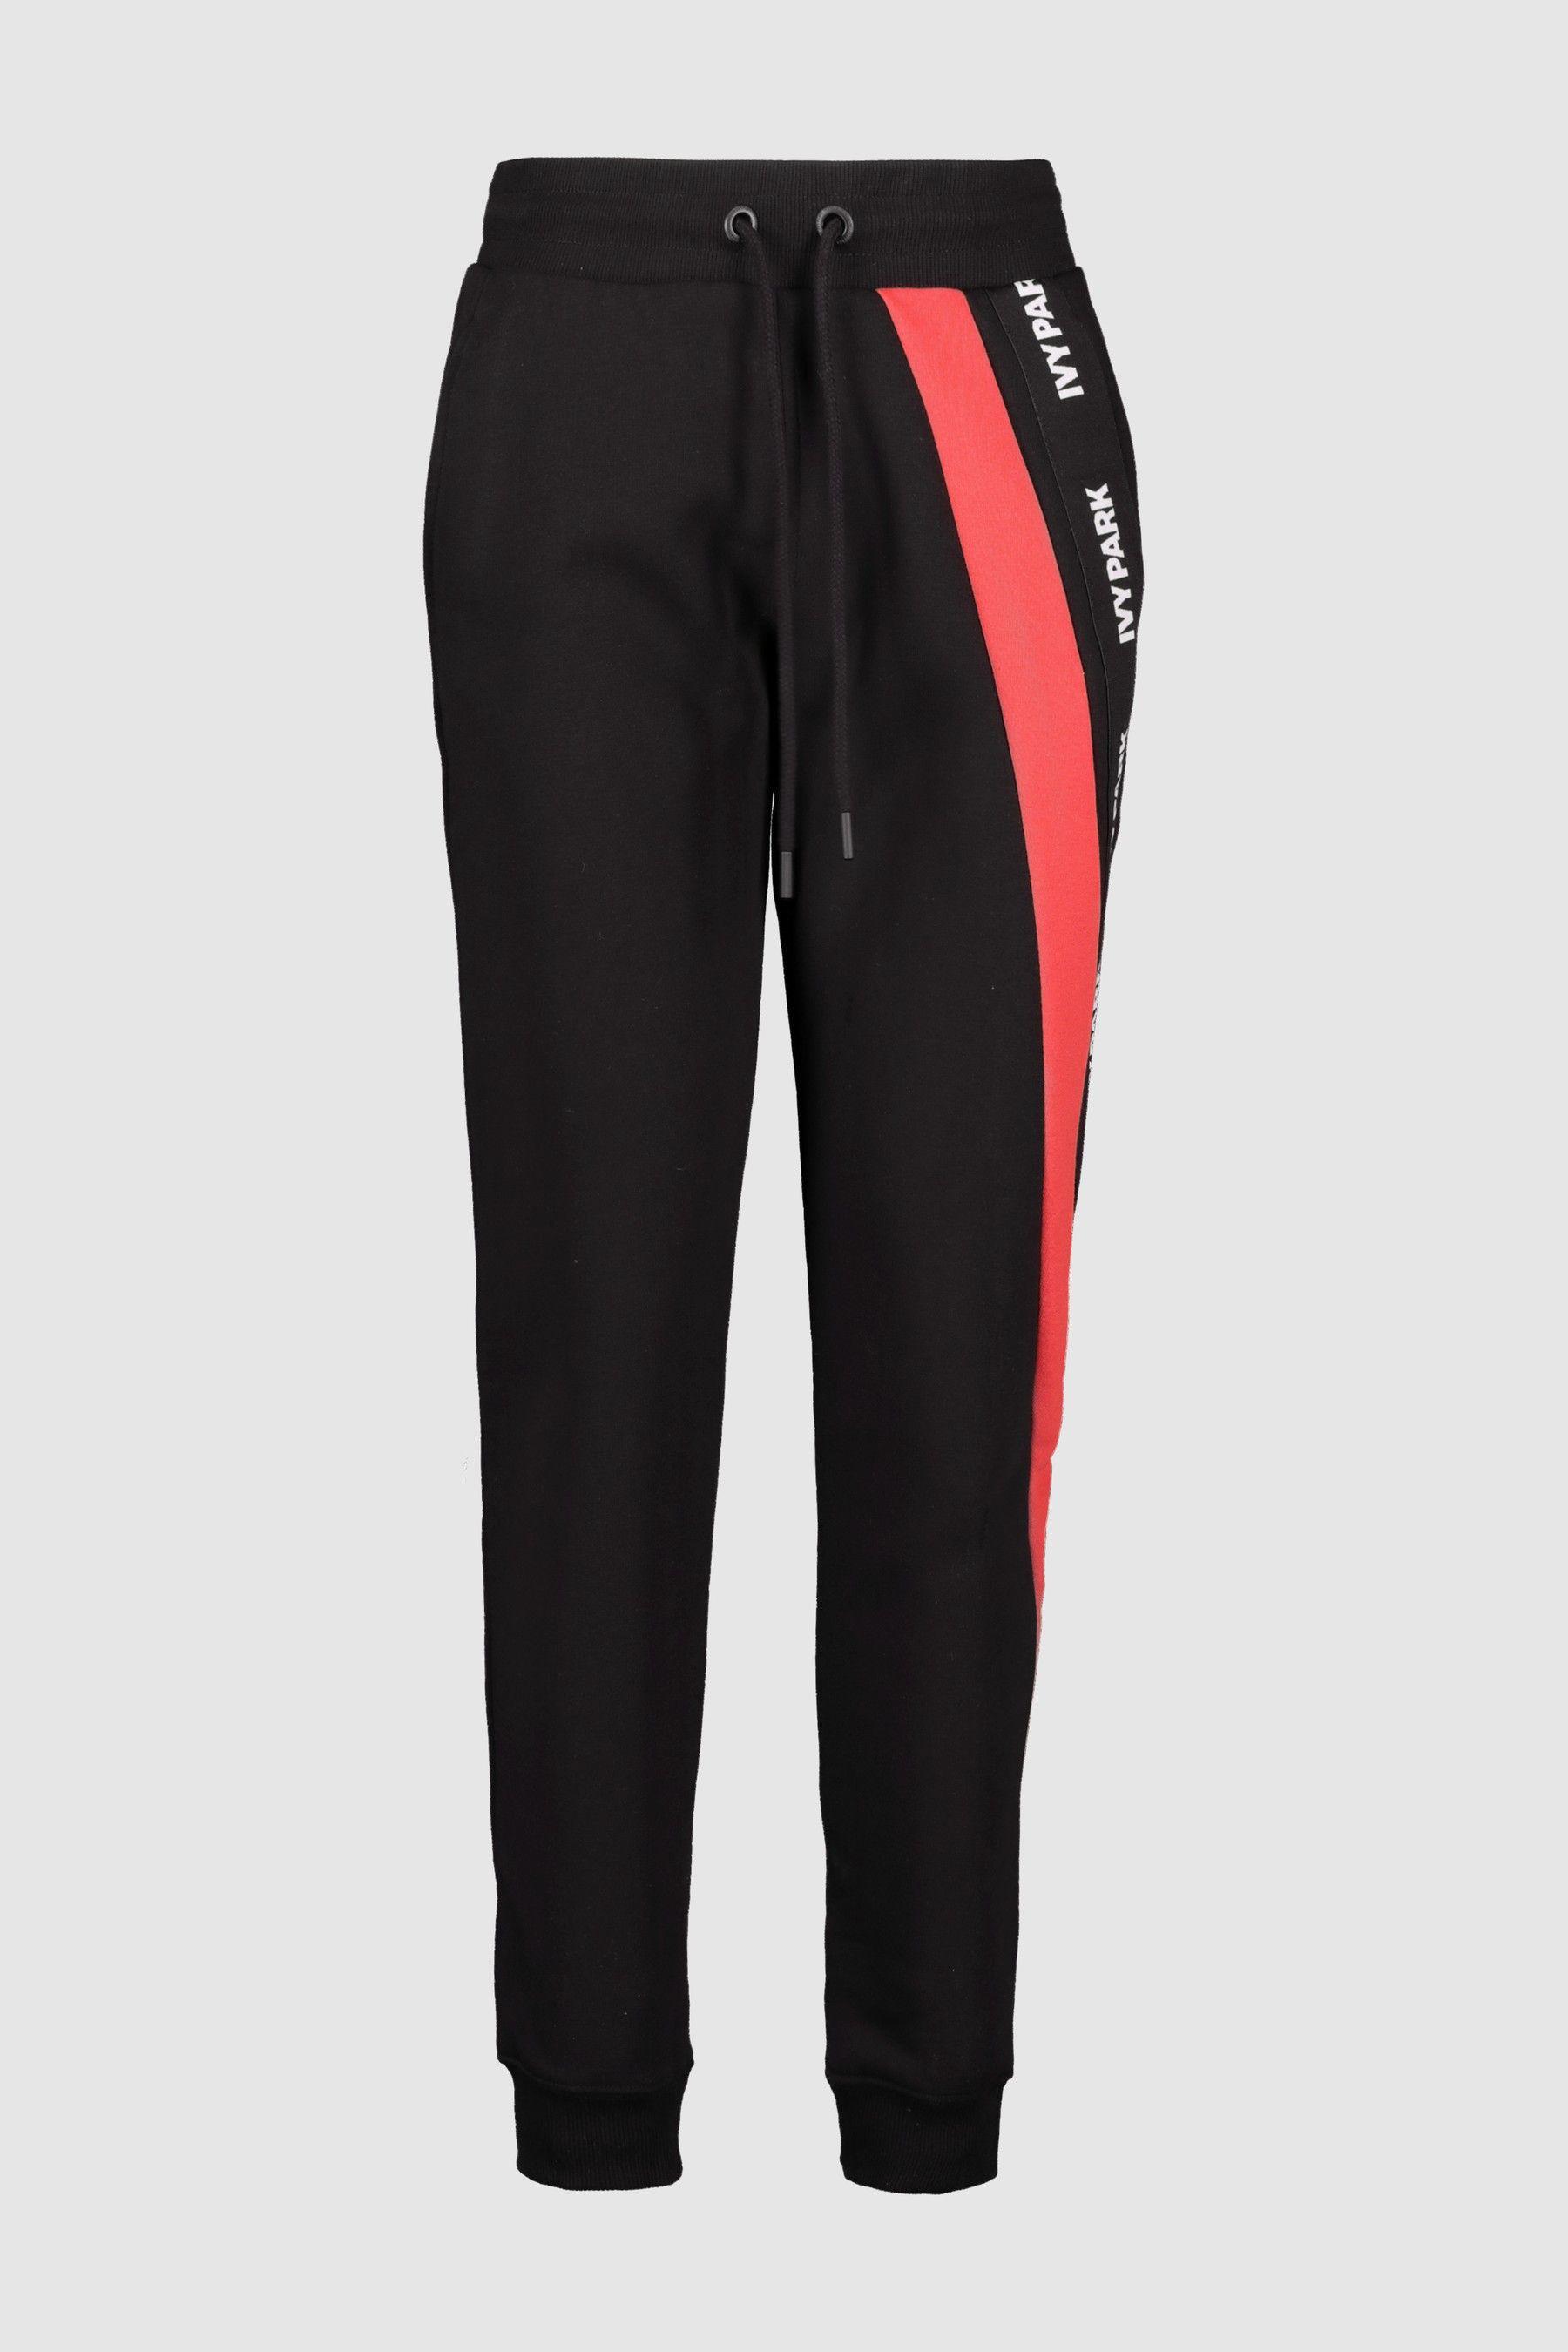 a79bce741f5d27 Womens Ivy Park Black Asymmetric Jogger - Black | Products | Ivy ...